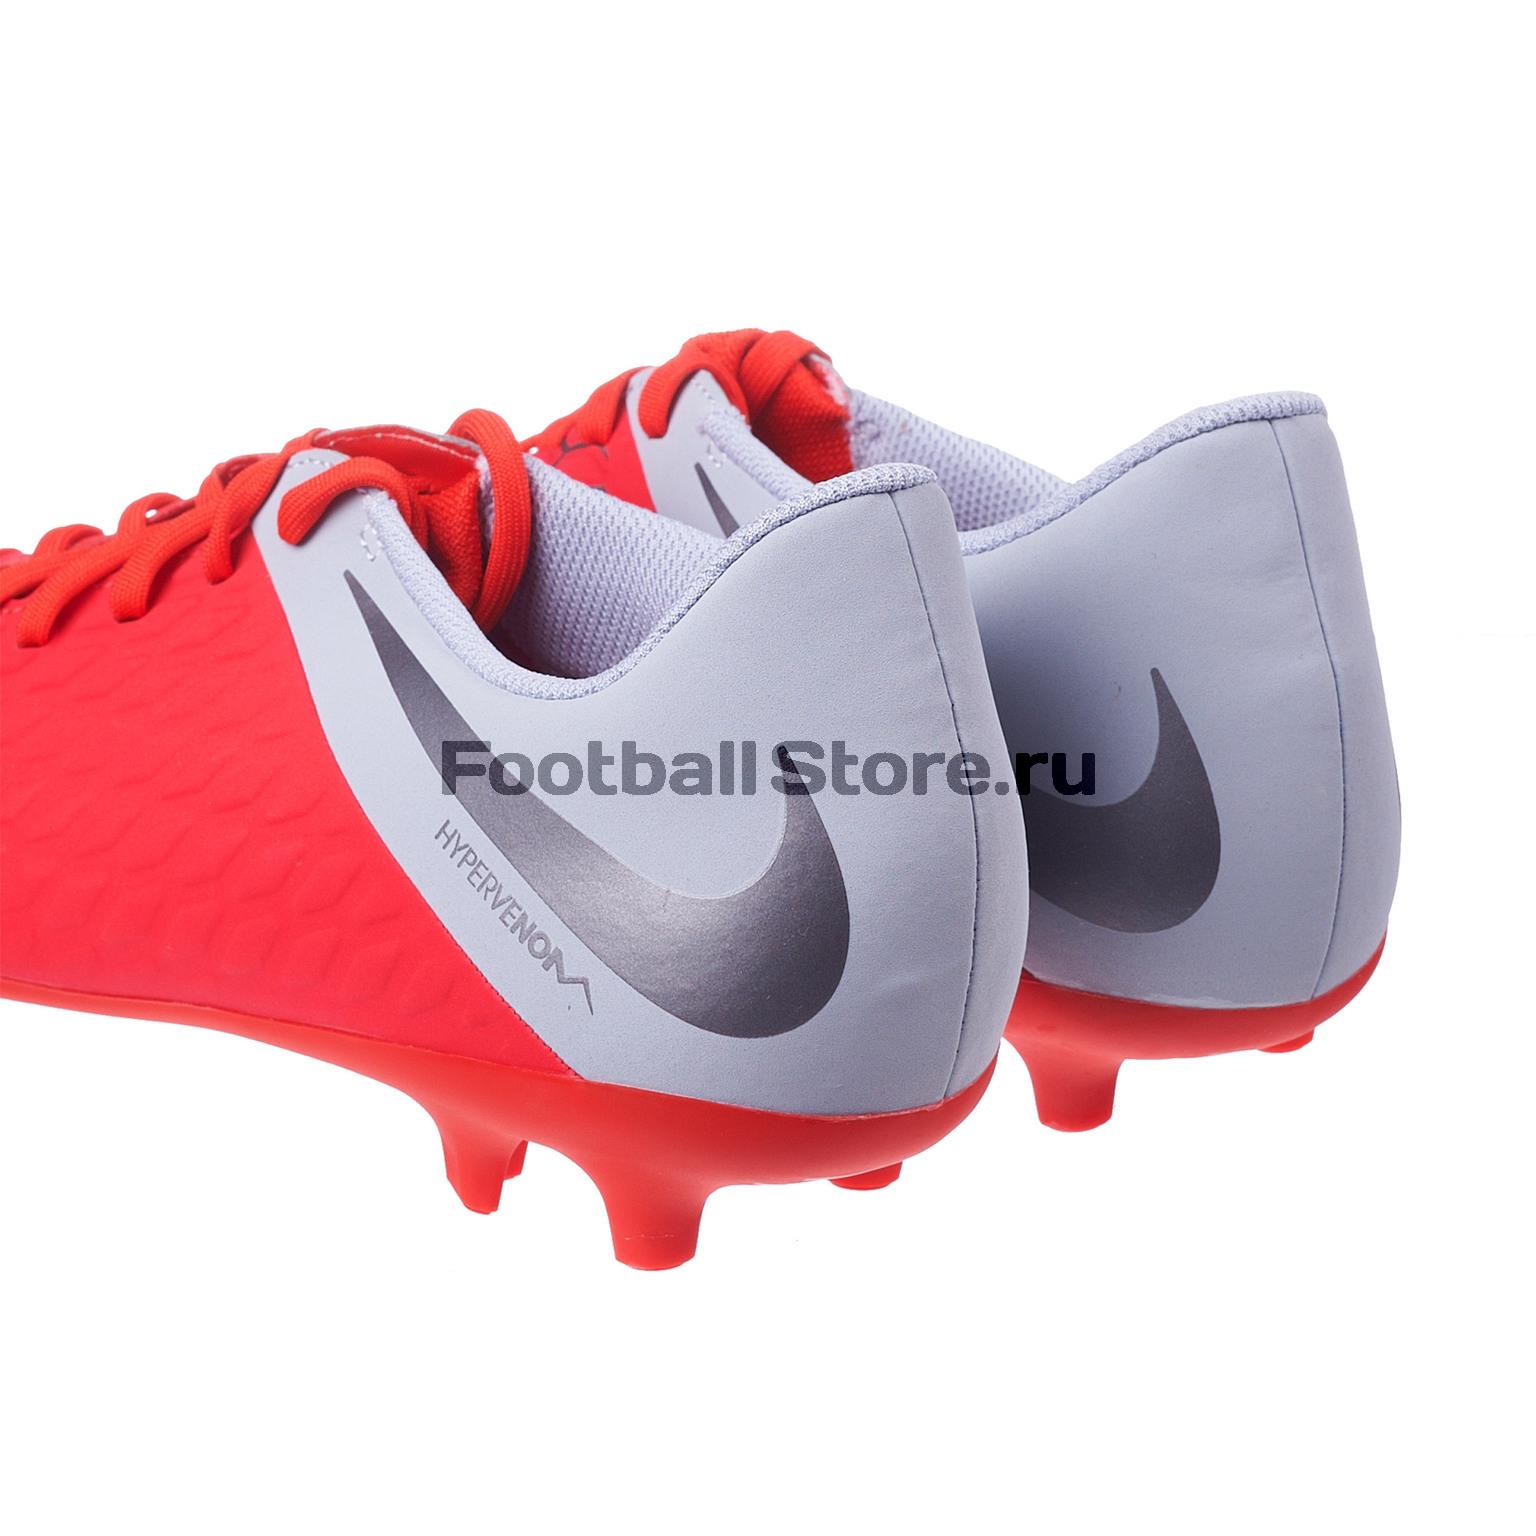 d8ca13a7 Бутсы Nike Hypervenom 3 Club FG AJ4145-600 – купить бутсы в интернет ...